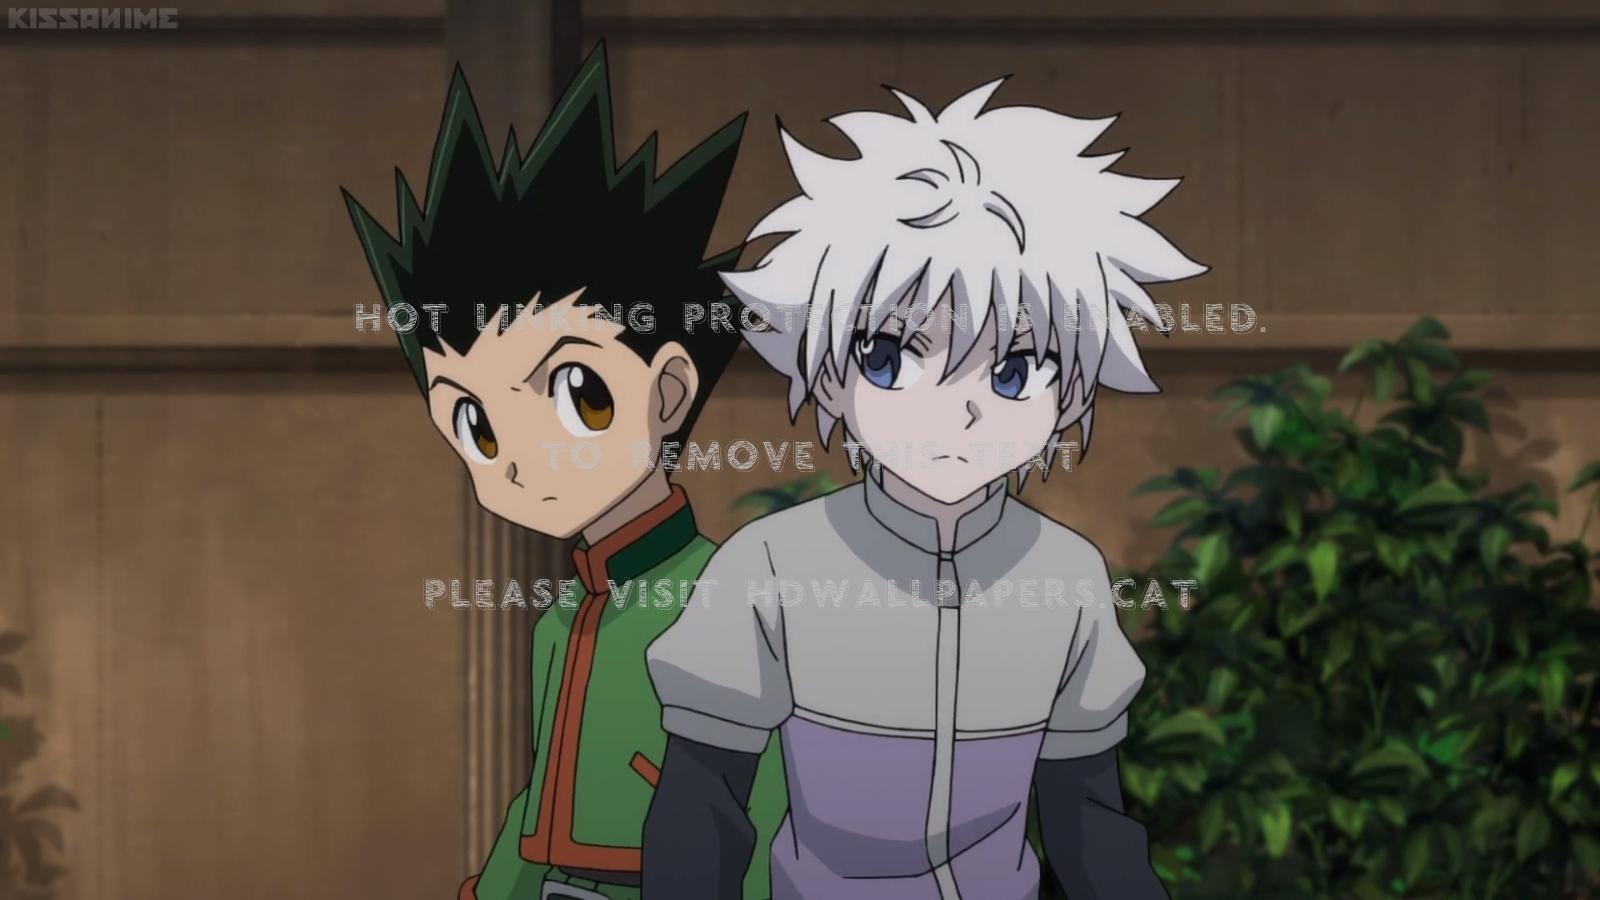 Gon / Killua Green Hair Spiky Hxh Anime Boy - Anime Boy Anime Green Hair , HD Wallpaper & Backgrounds